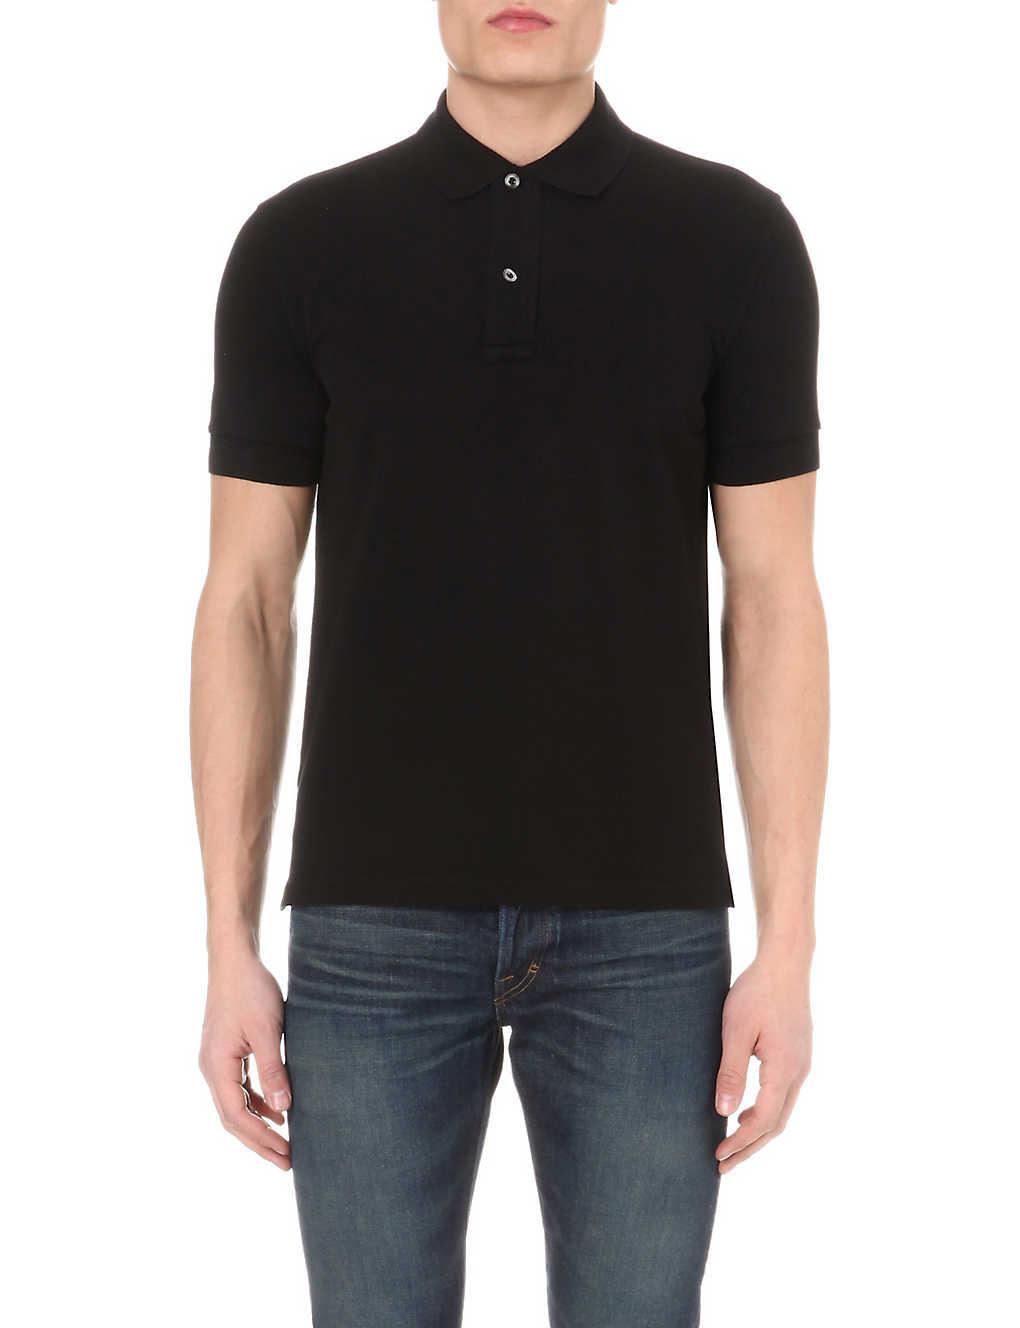 783d943f TOM FORD - Short-sleeved cotton-piqué polo shirt | Selfridges.com